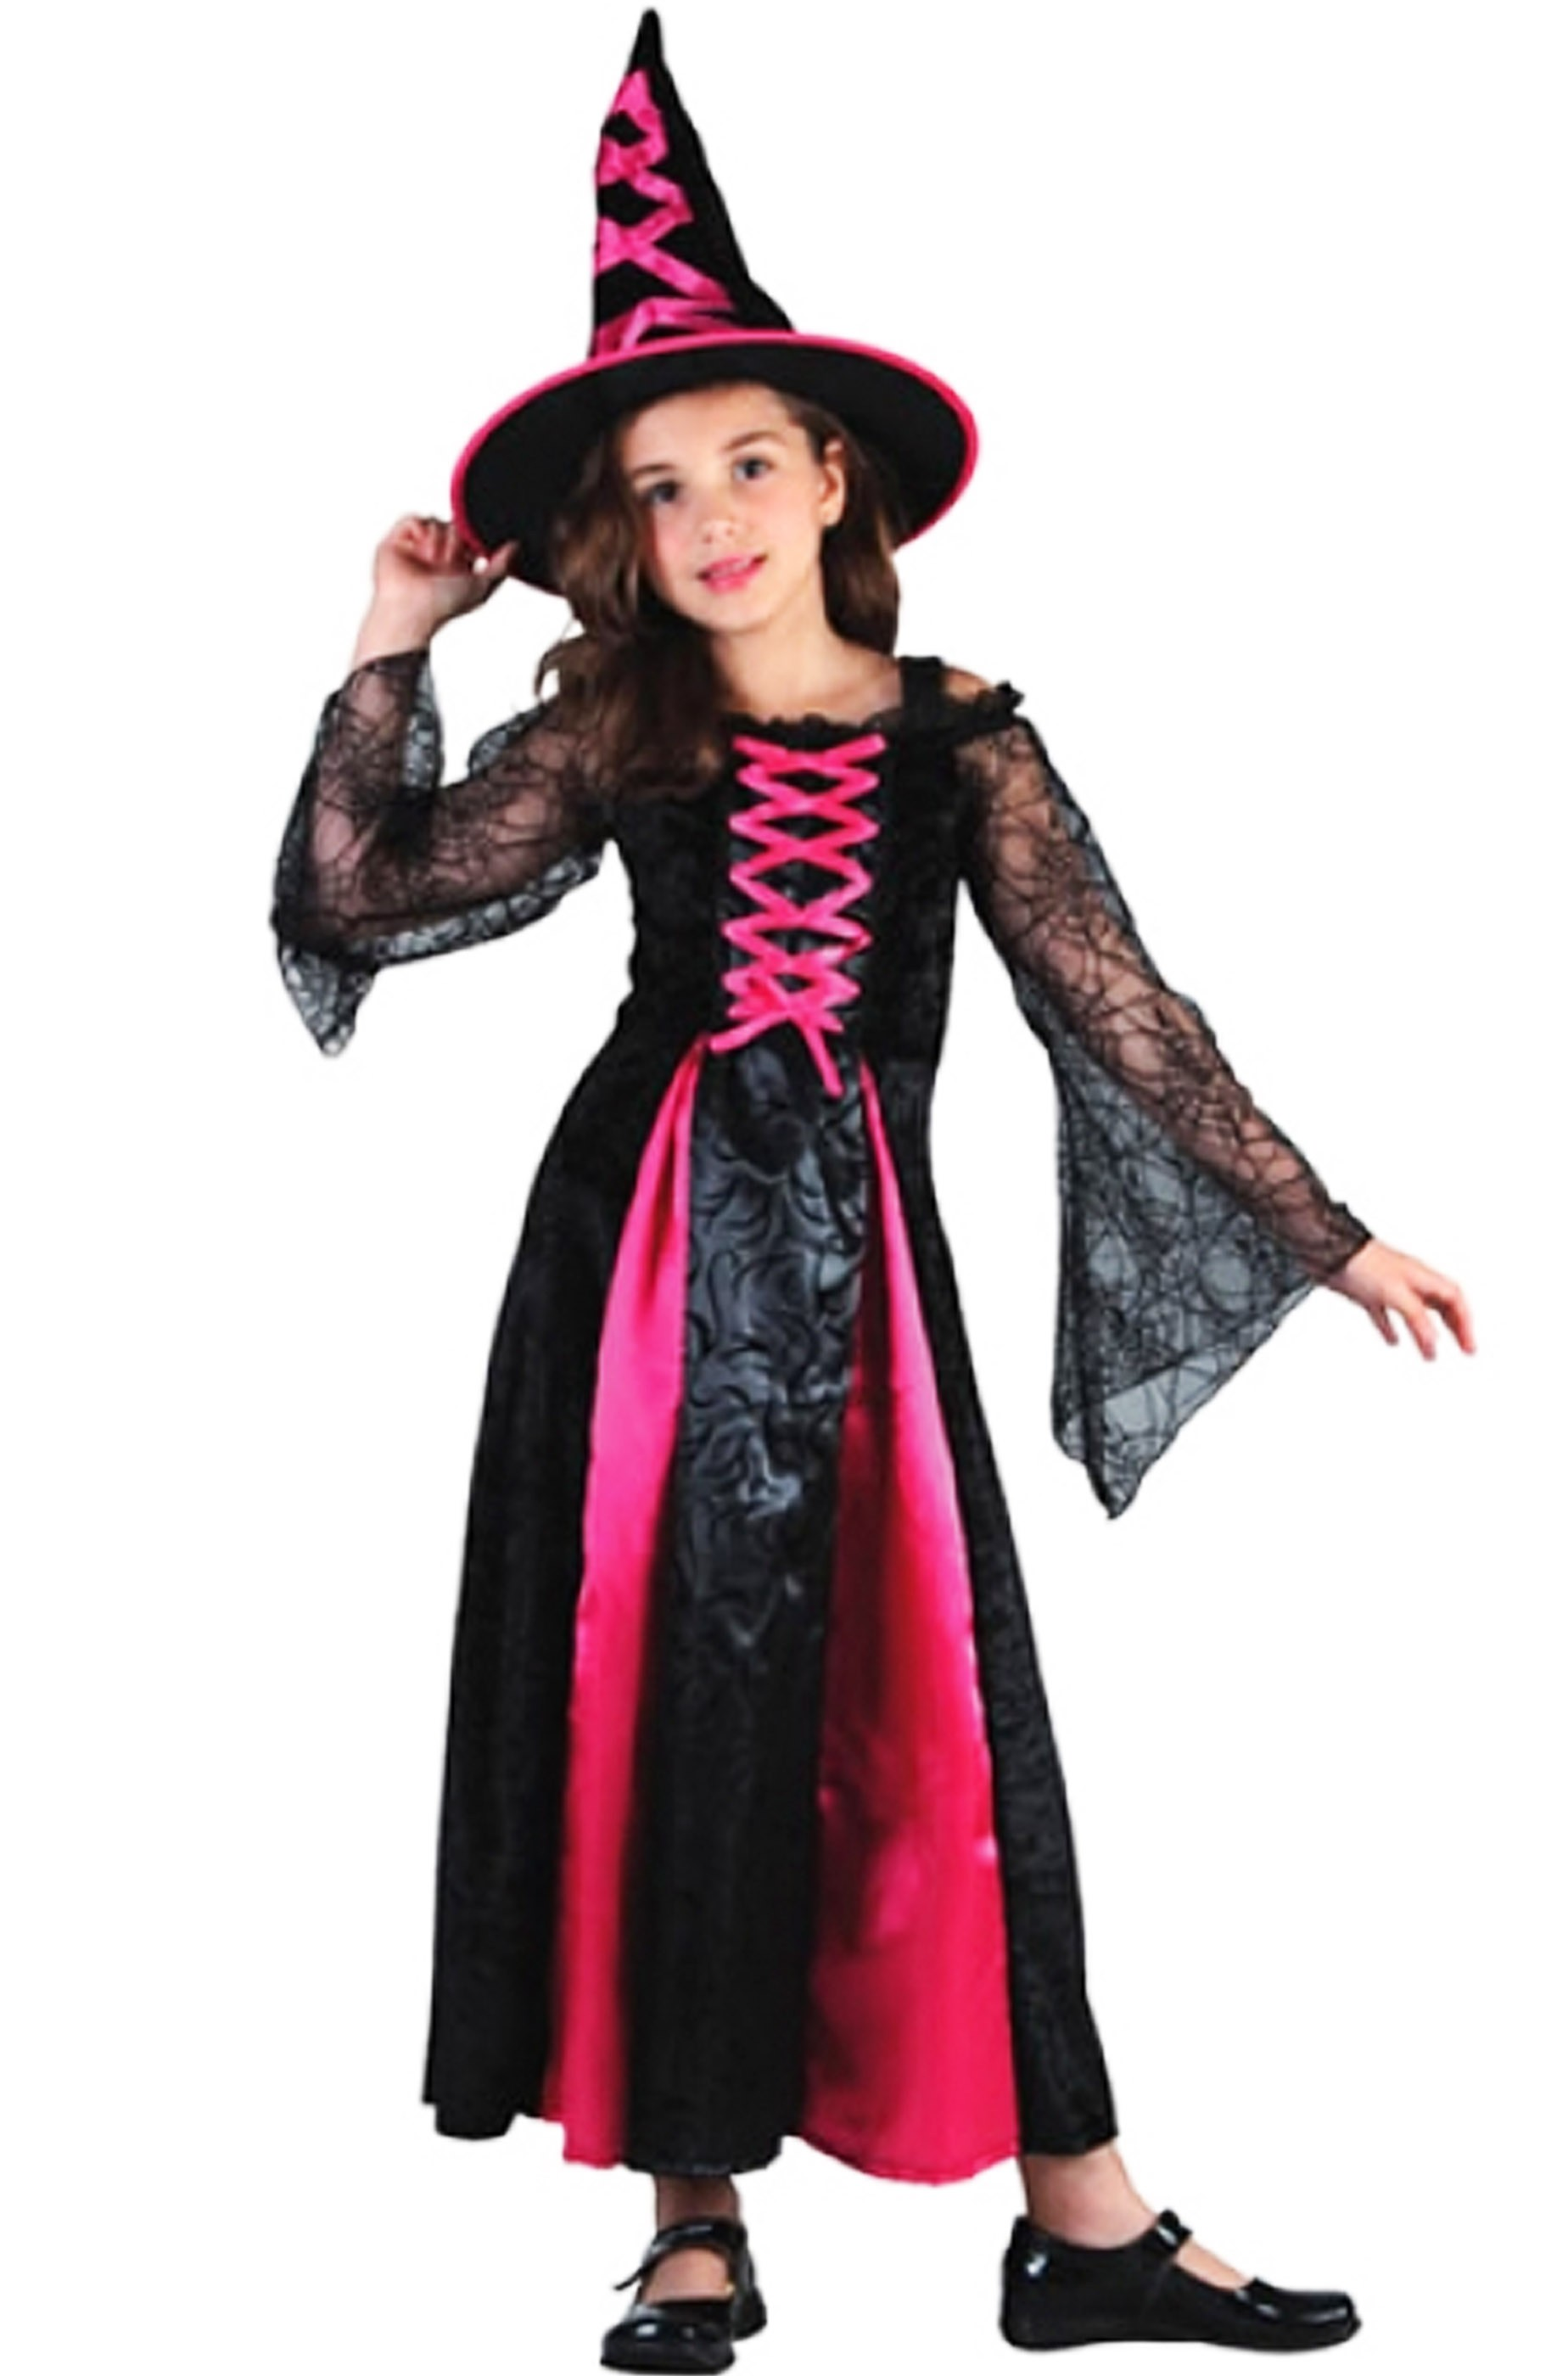 costume di Halloween bambina da strega lunga ed elegante rossa e nera 5f227ef87190